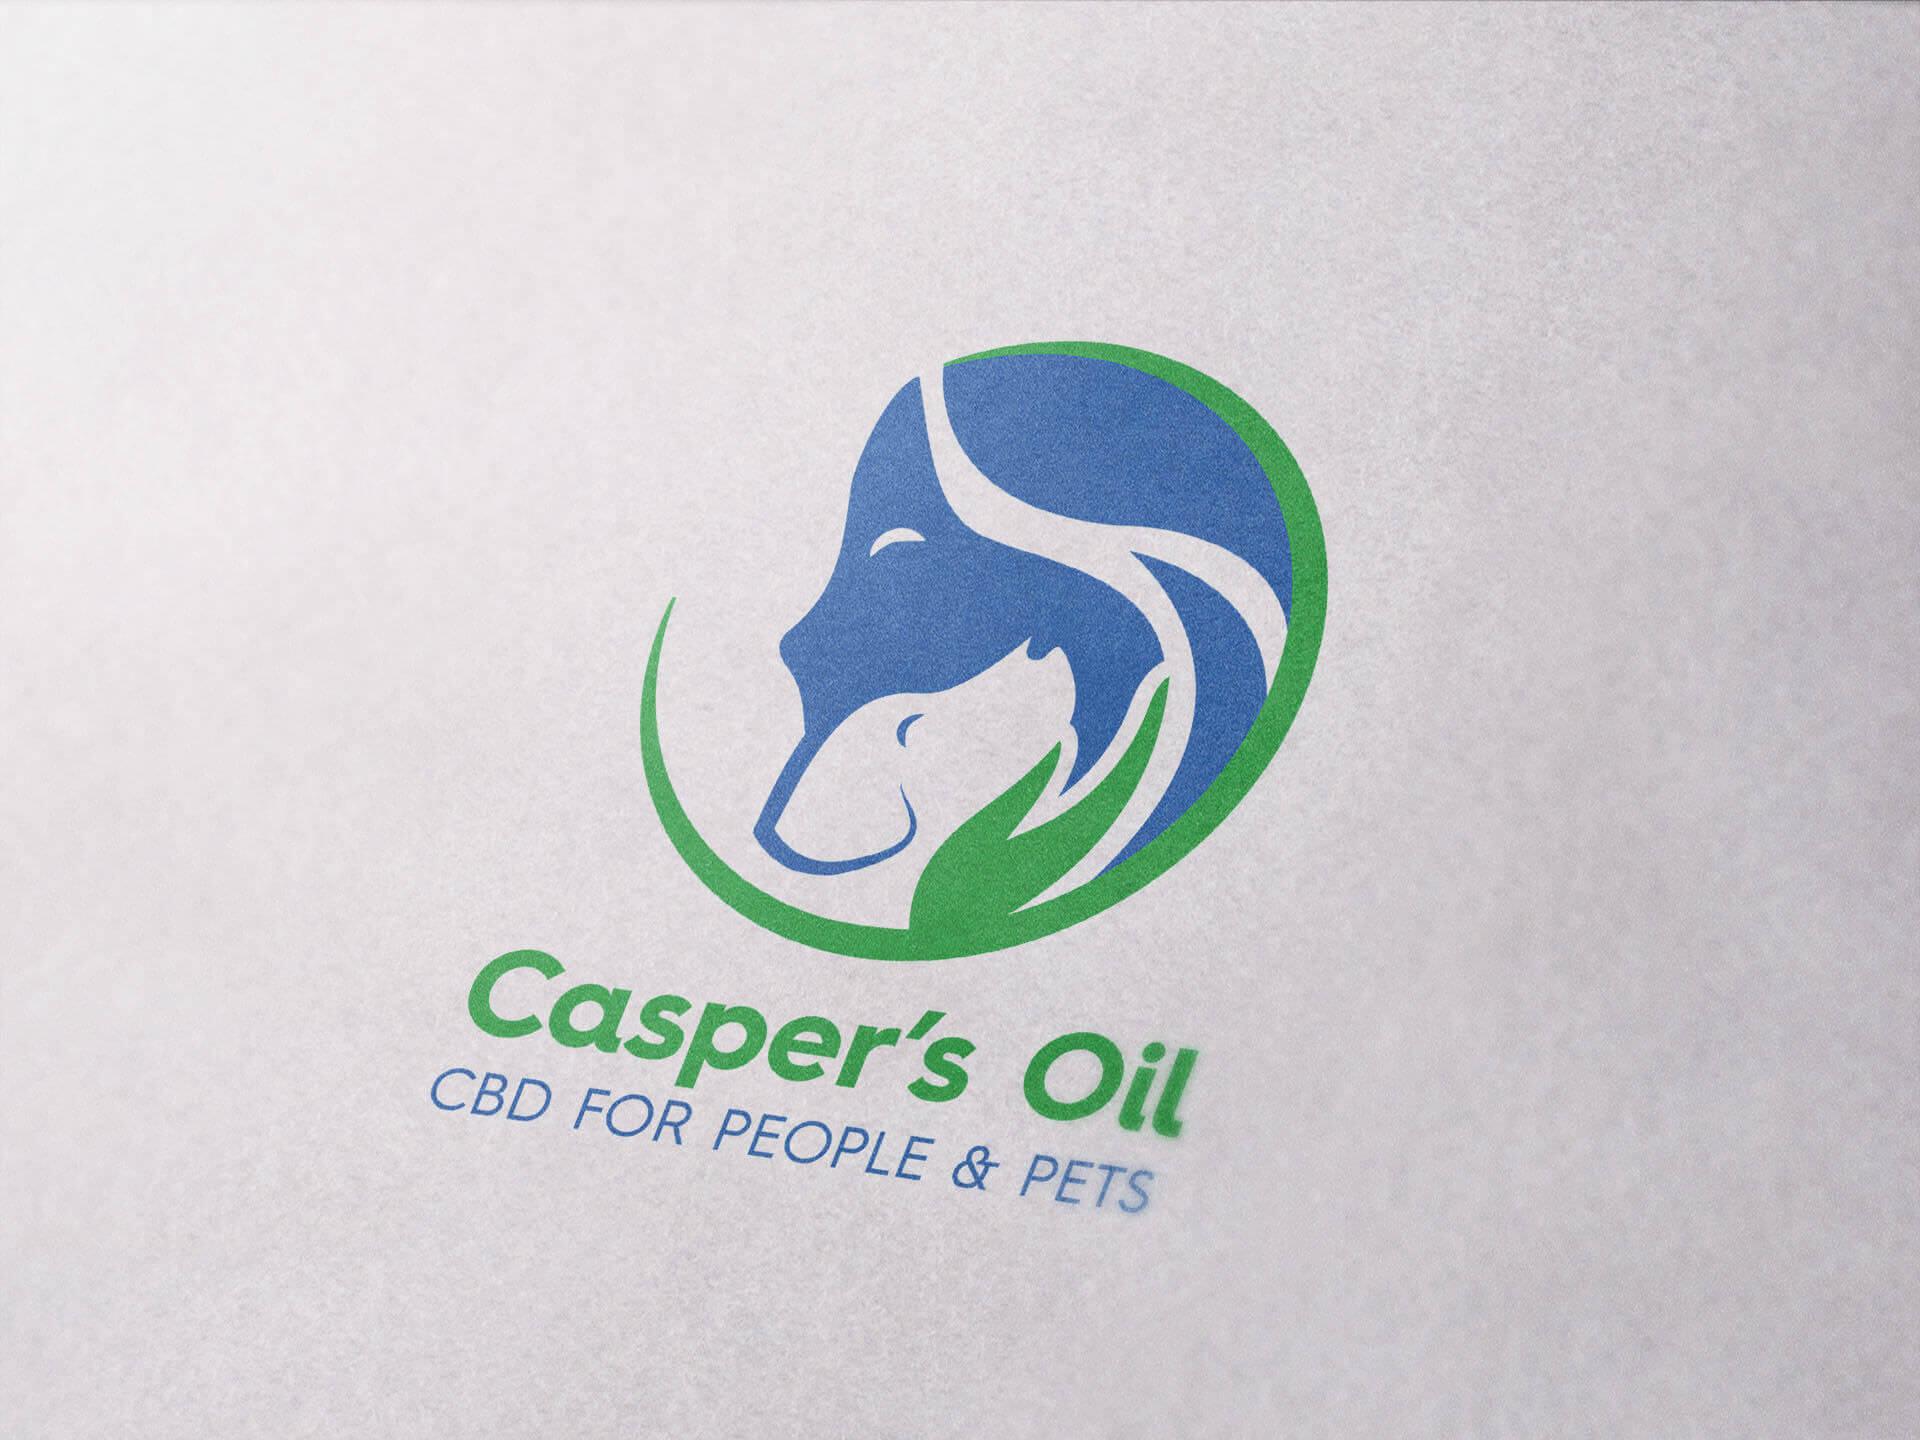 BMGcreative - Casper's Oil Logo Redesign